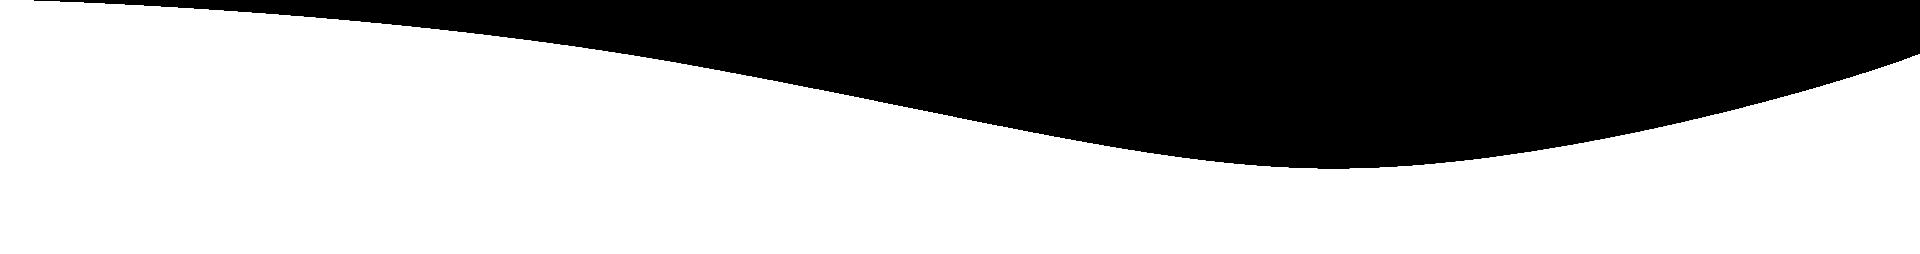 onda-branca-ces